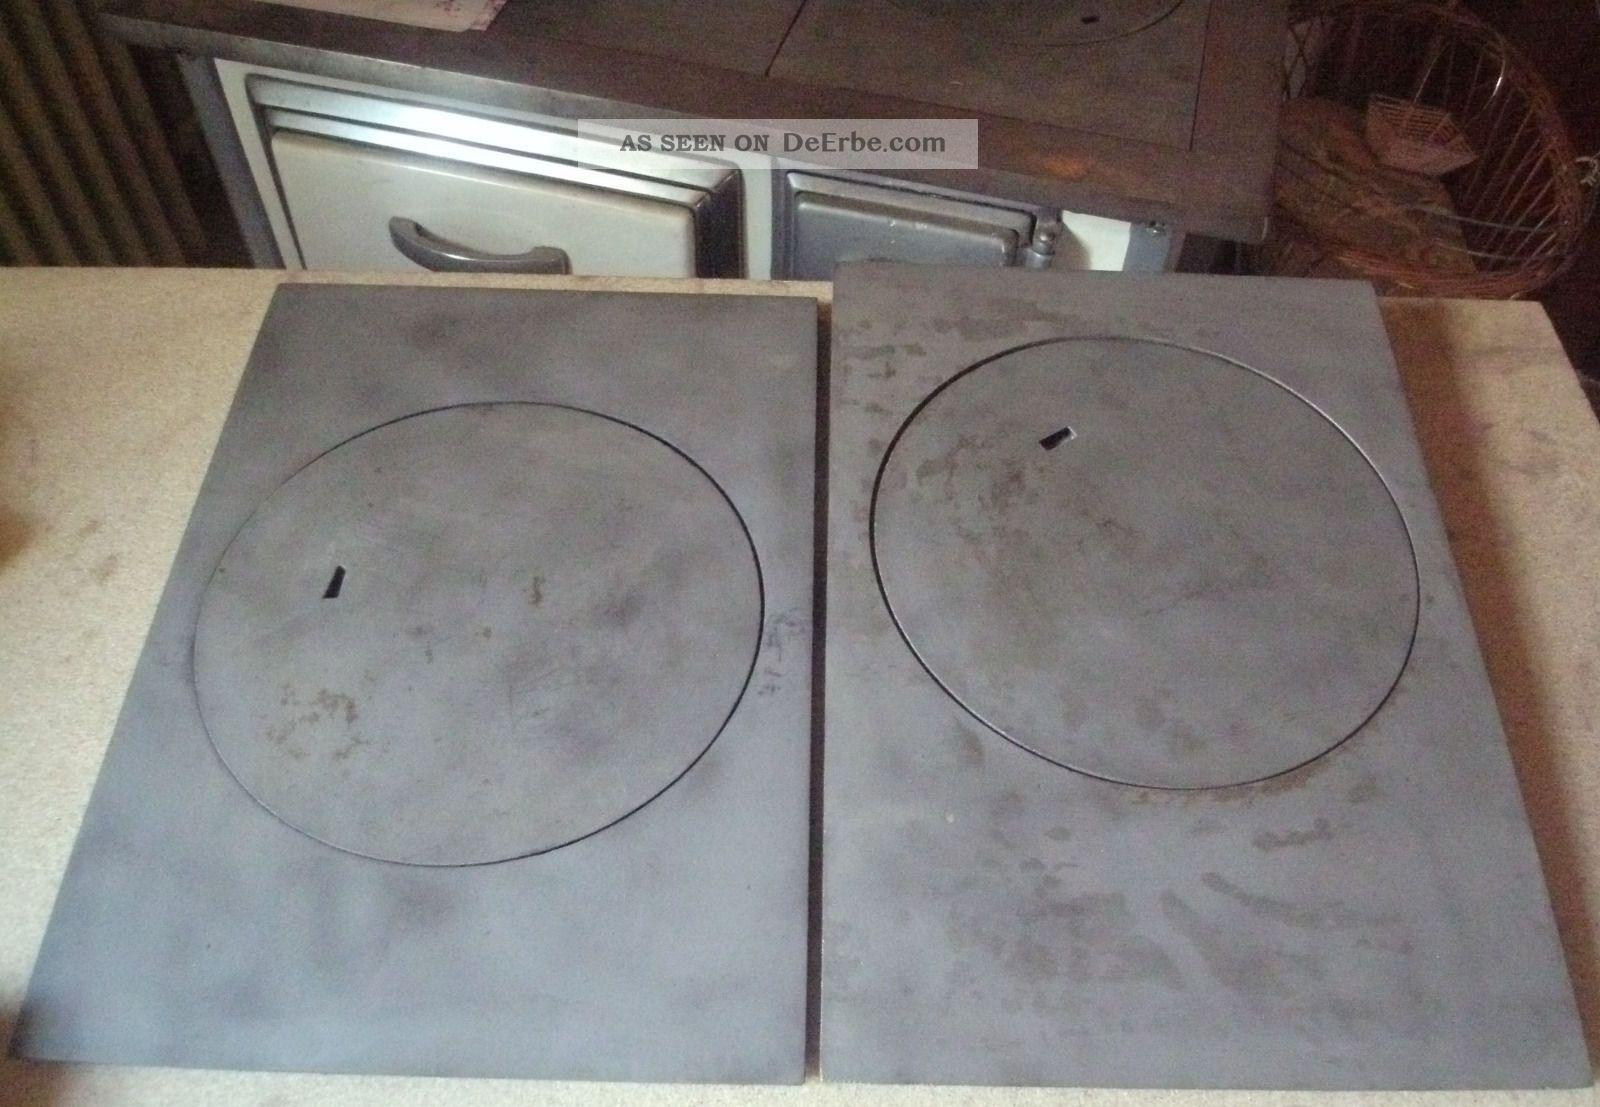 4 Tlg Ofenplatte Herdplatten Zentralplatten Guss Ca.  9,  5 Kg Nie Benutzt Original, vor 1960 gefertigt Bild